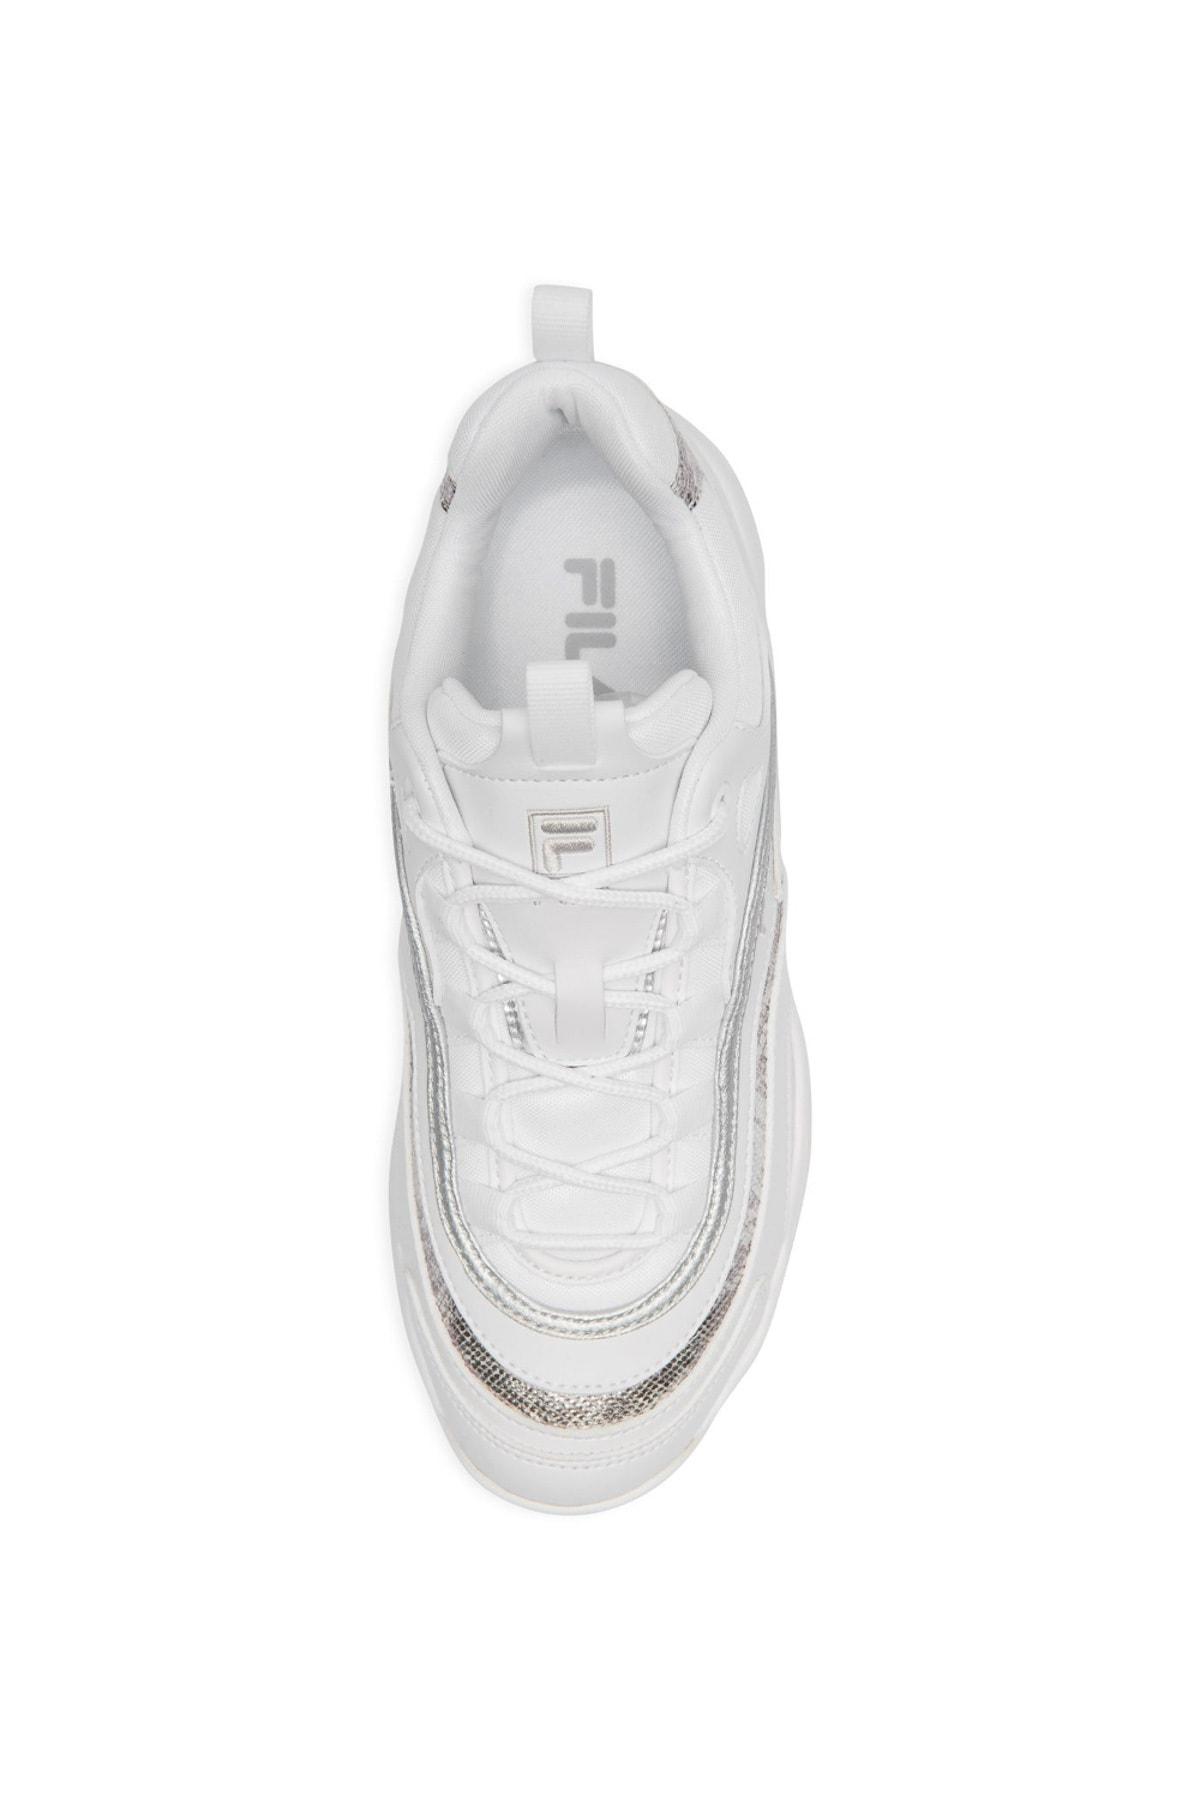 Fila Kadın Sneaker - 1010879_93N 2